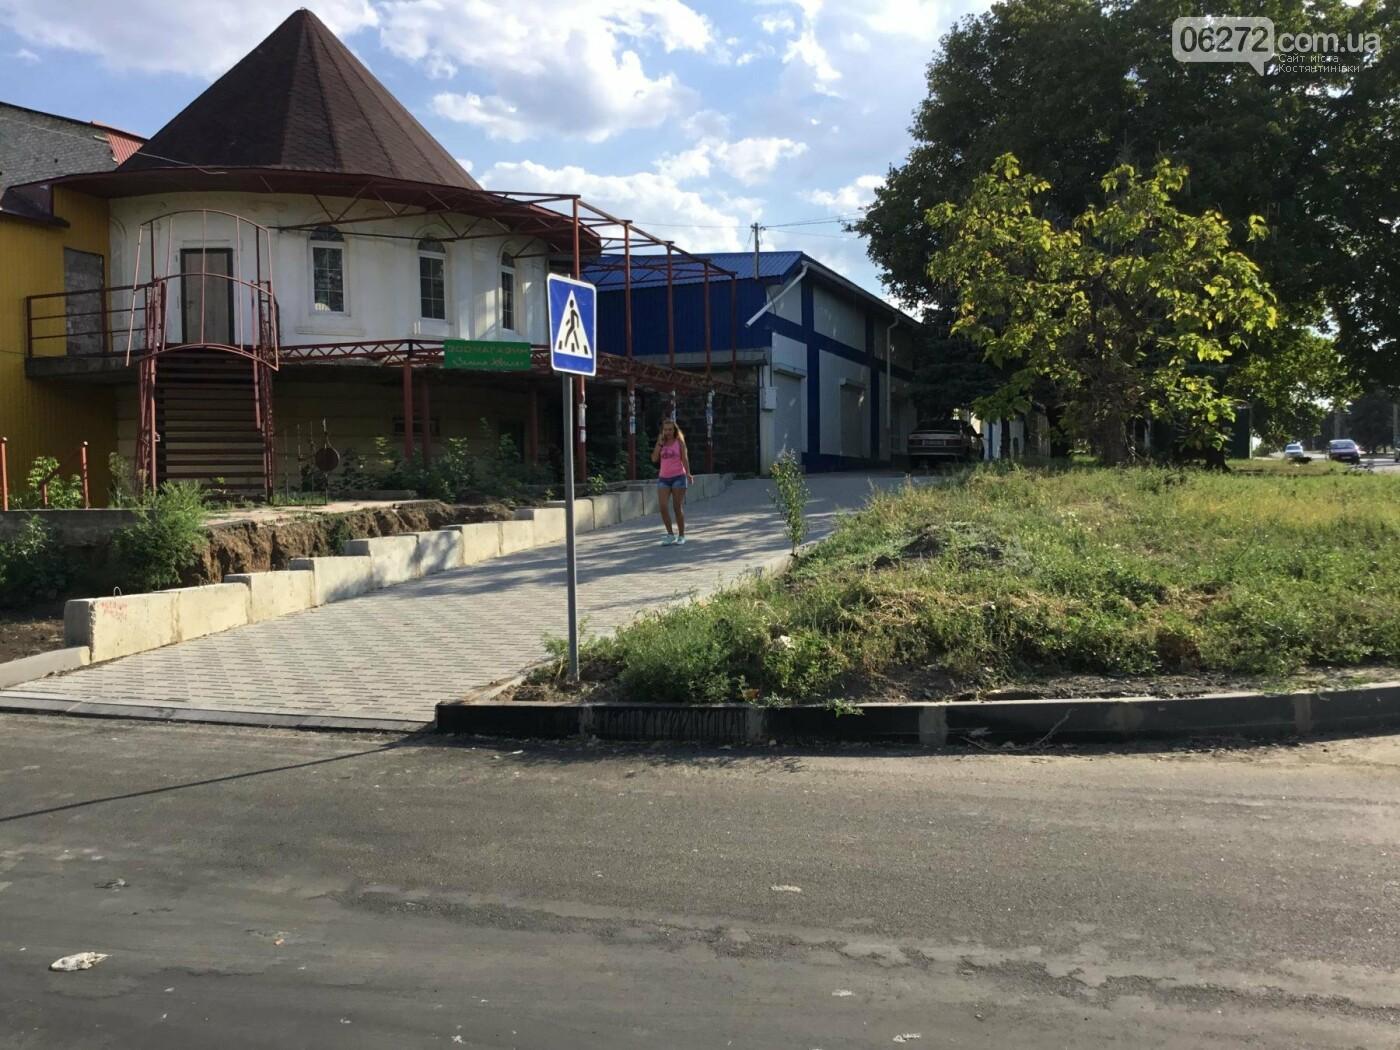 Дорога после ремонта по ул. Леваневского в Константиновке, фото-14